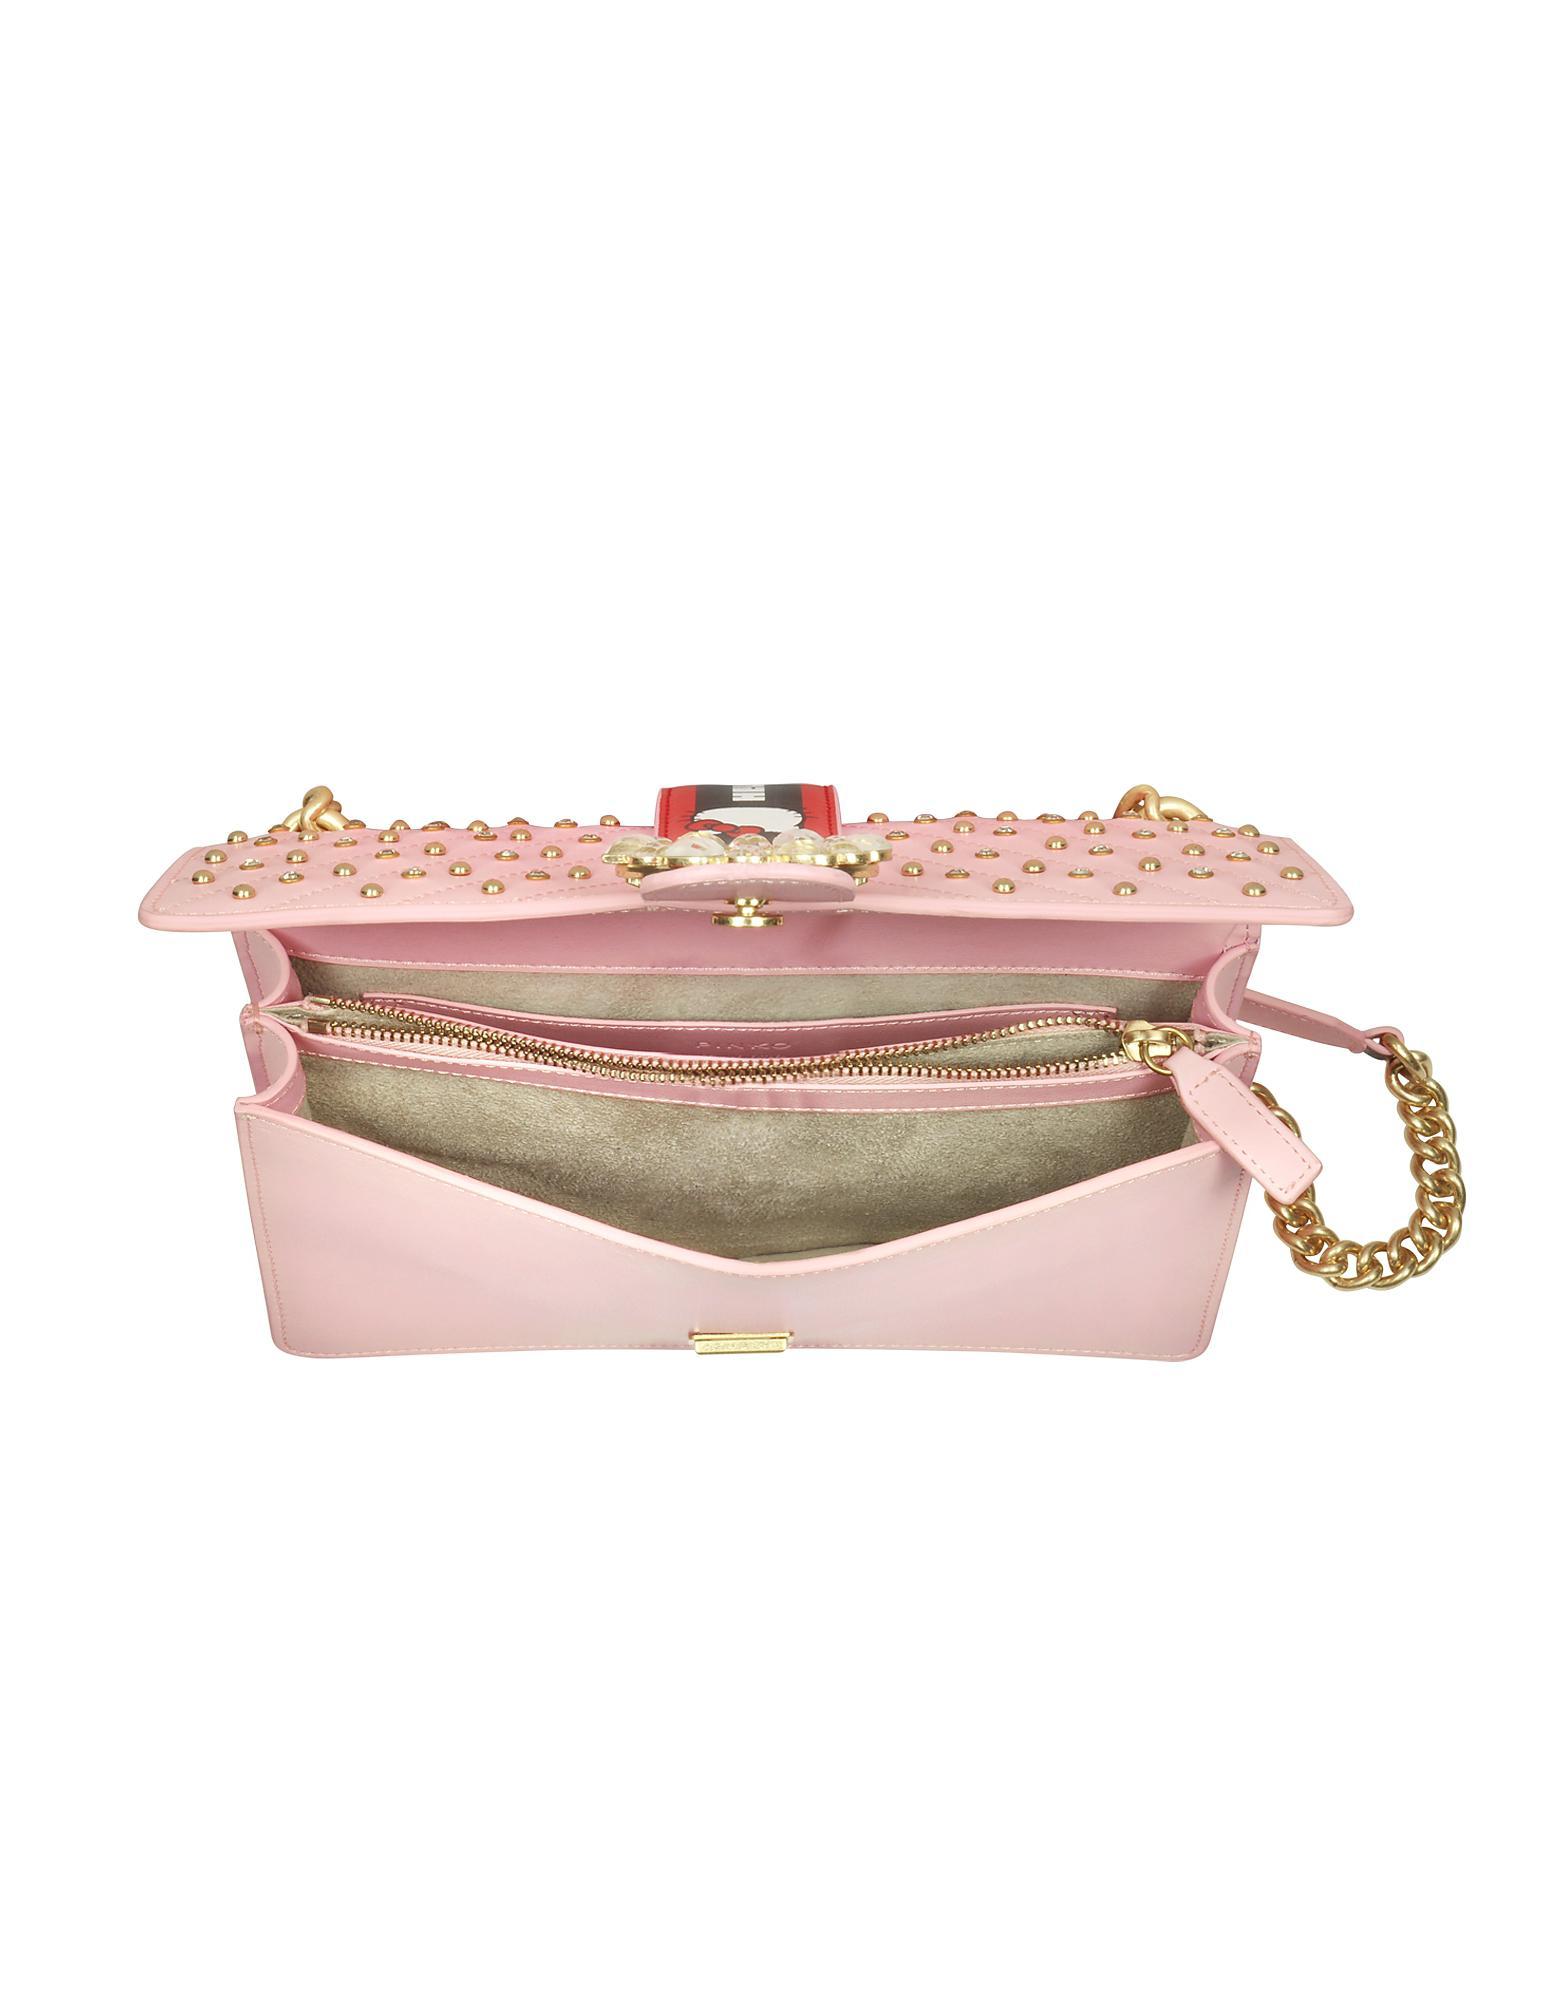 b982f2b7c5db Pinko Love Hello Kitty Jewel Pink Eco Leather Shoulder Bag in Pink ...